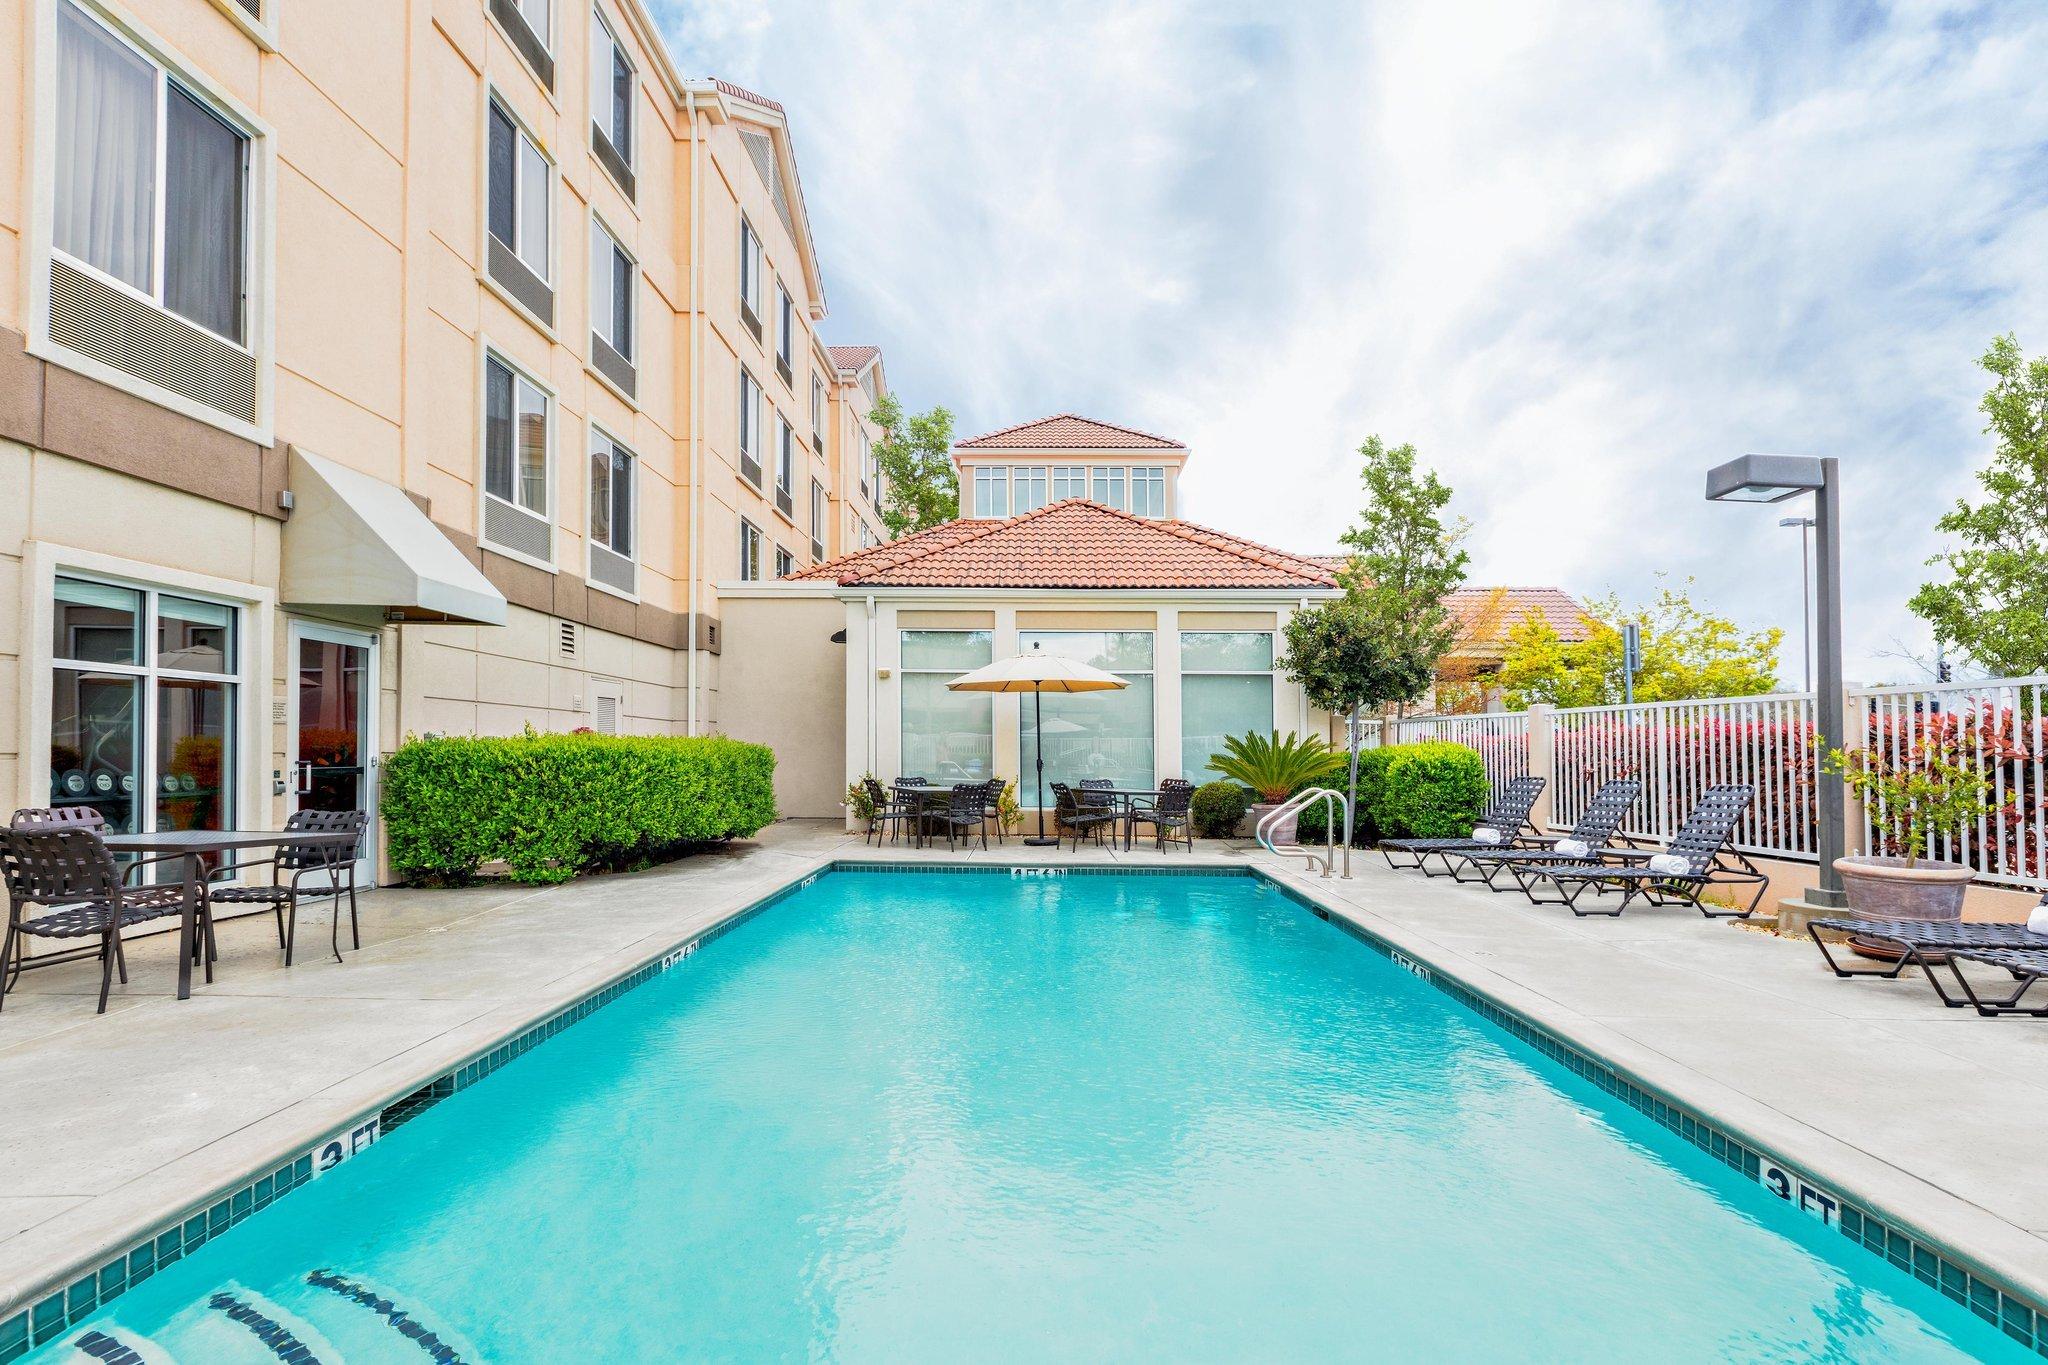 Hilton Garden Inn Folsom